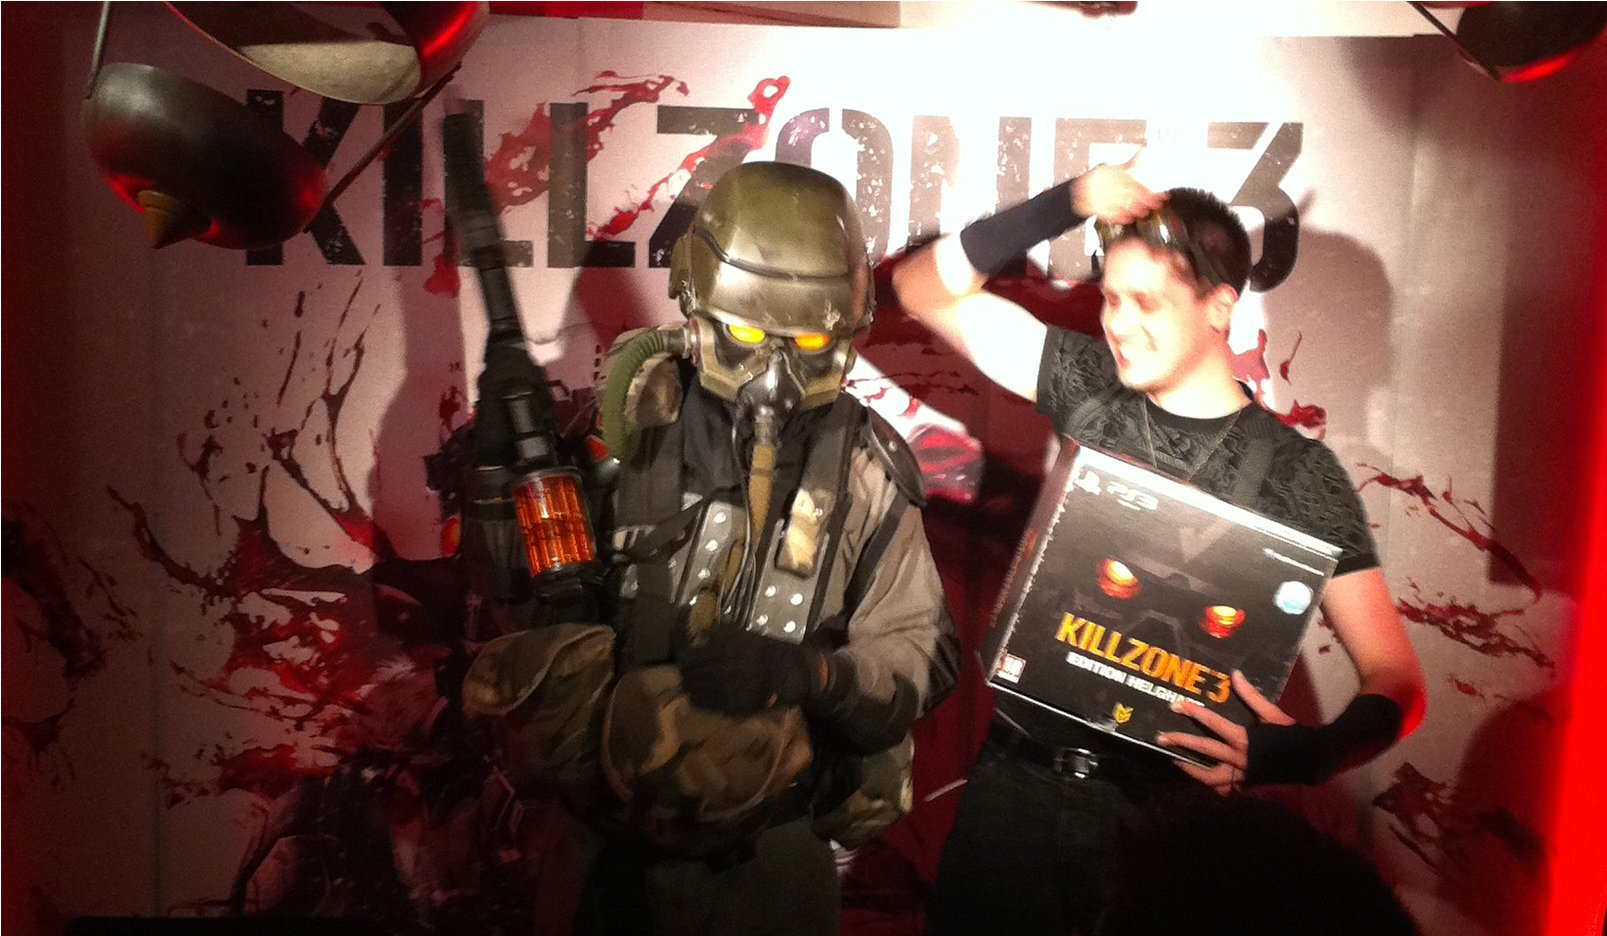 Event Killzone 3